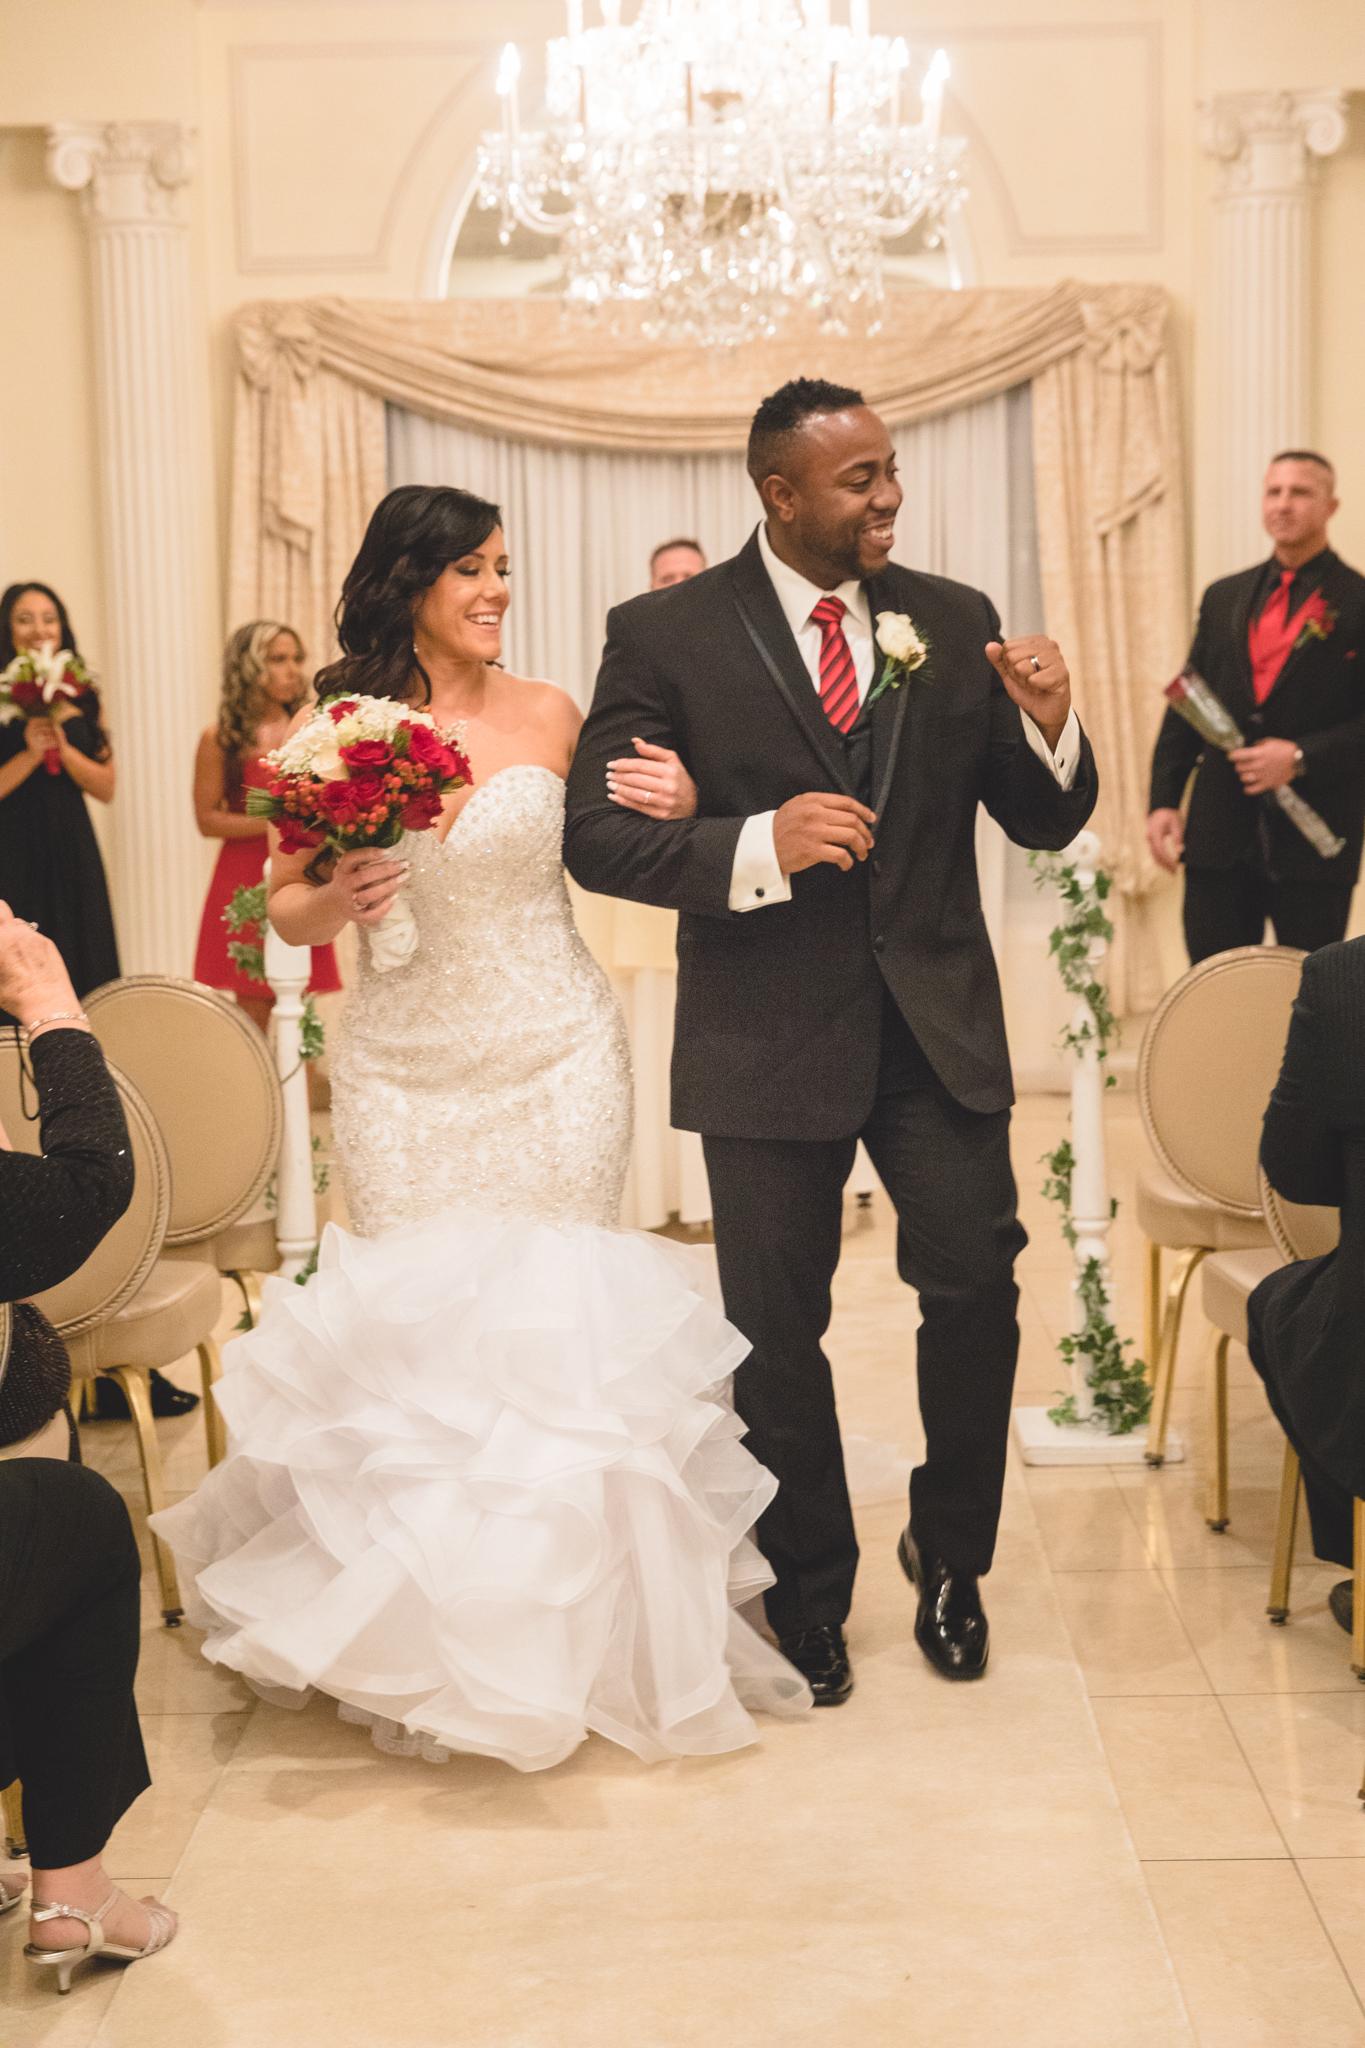 Long Island Wedding Photographer Shannon Lee Photography-18.jpg